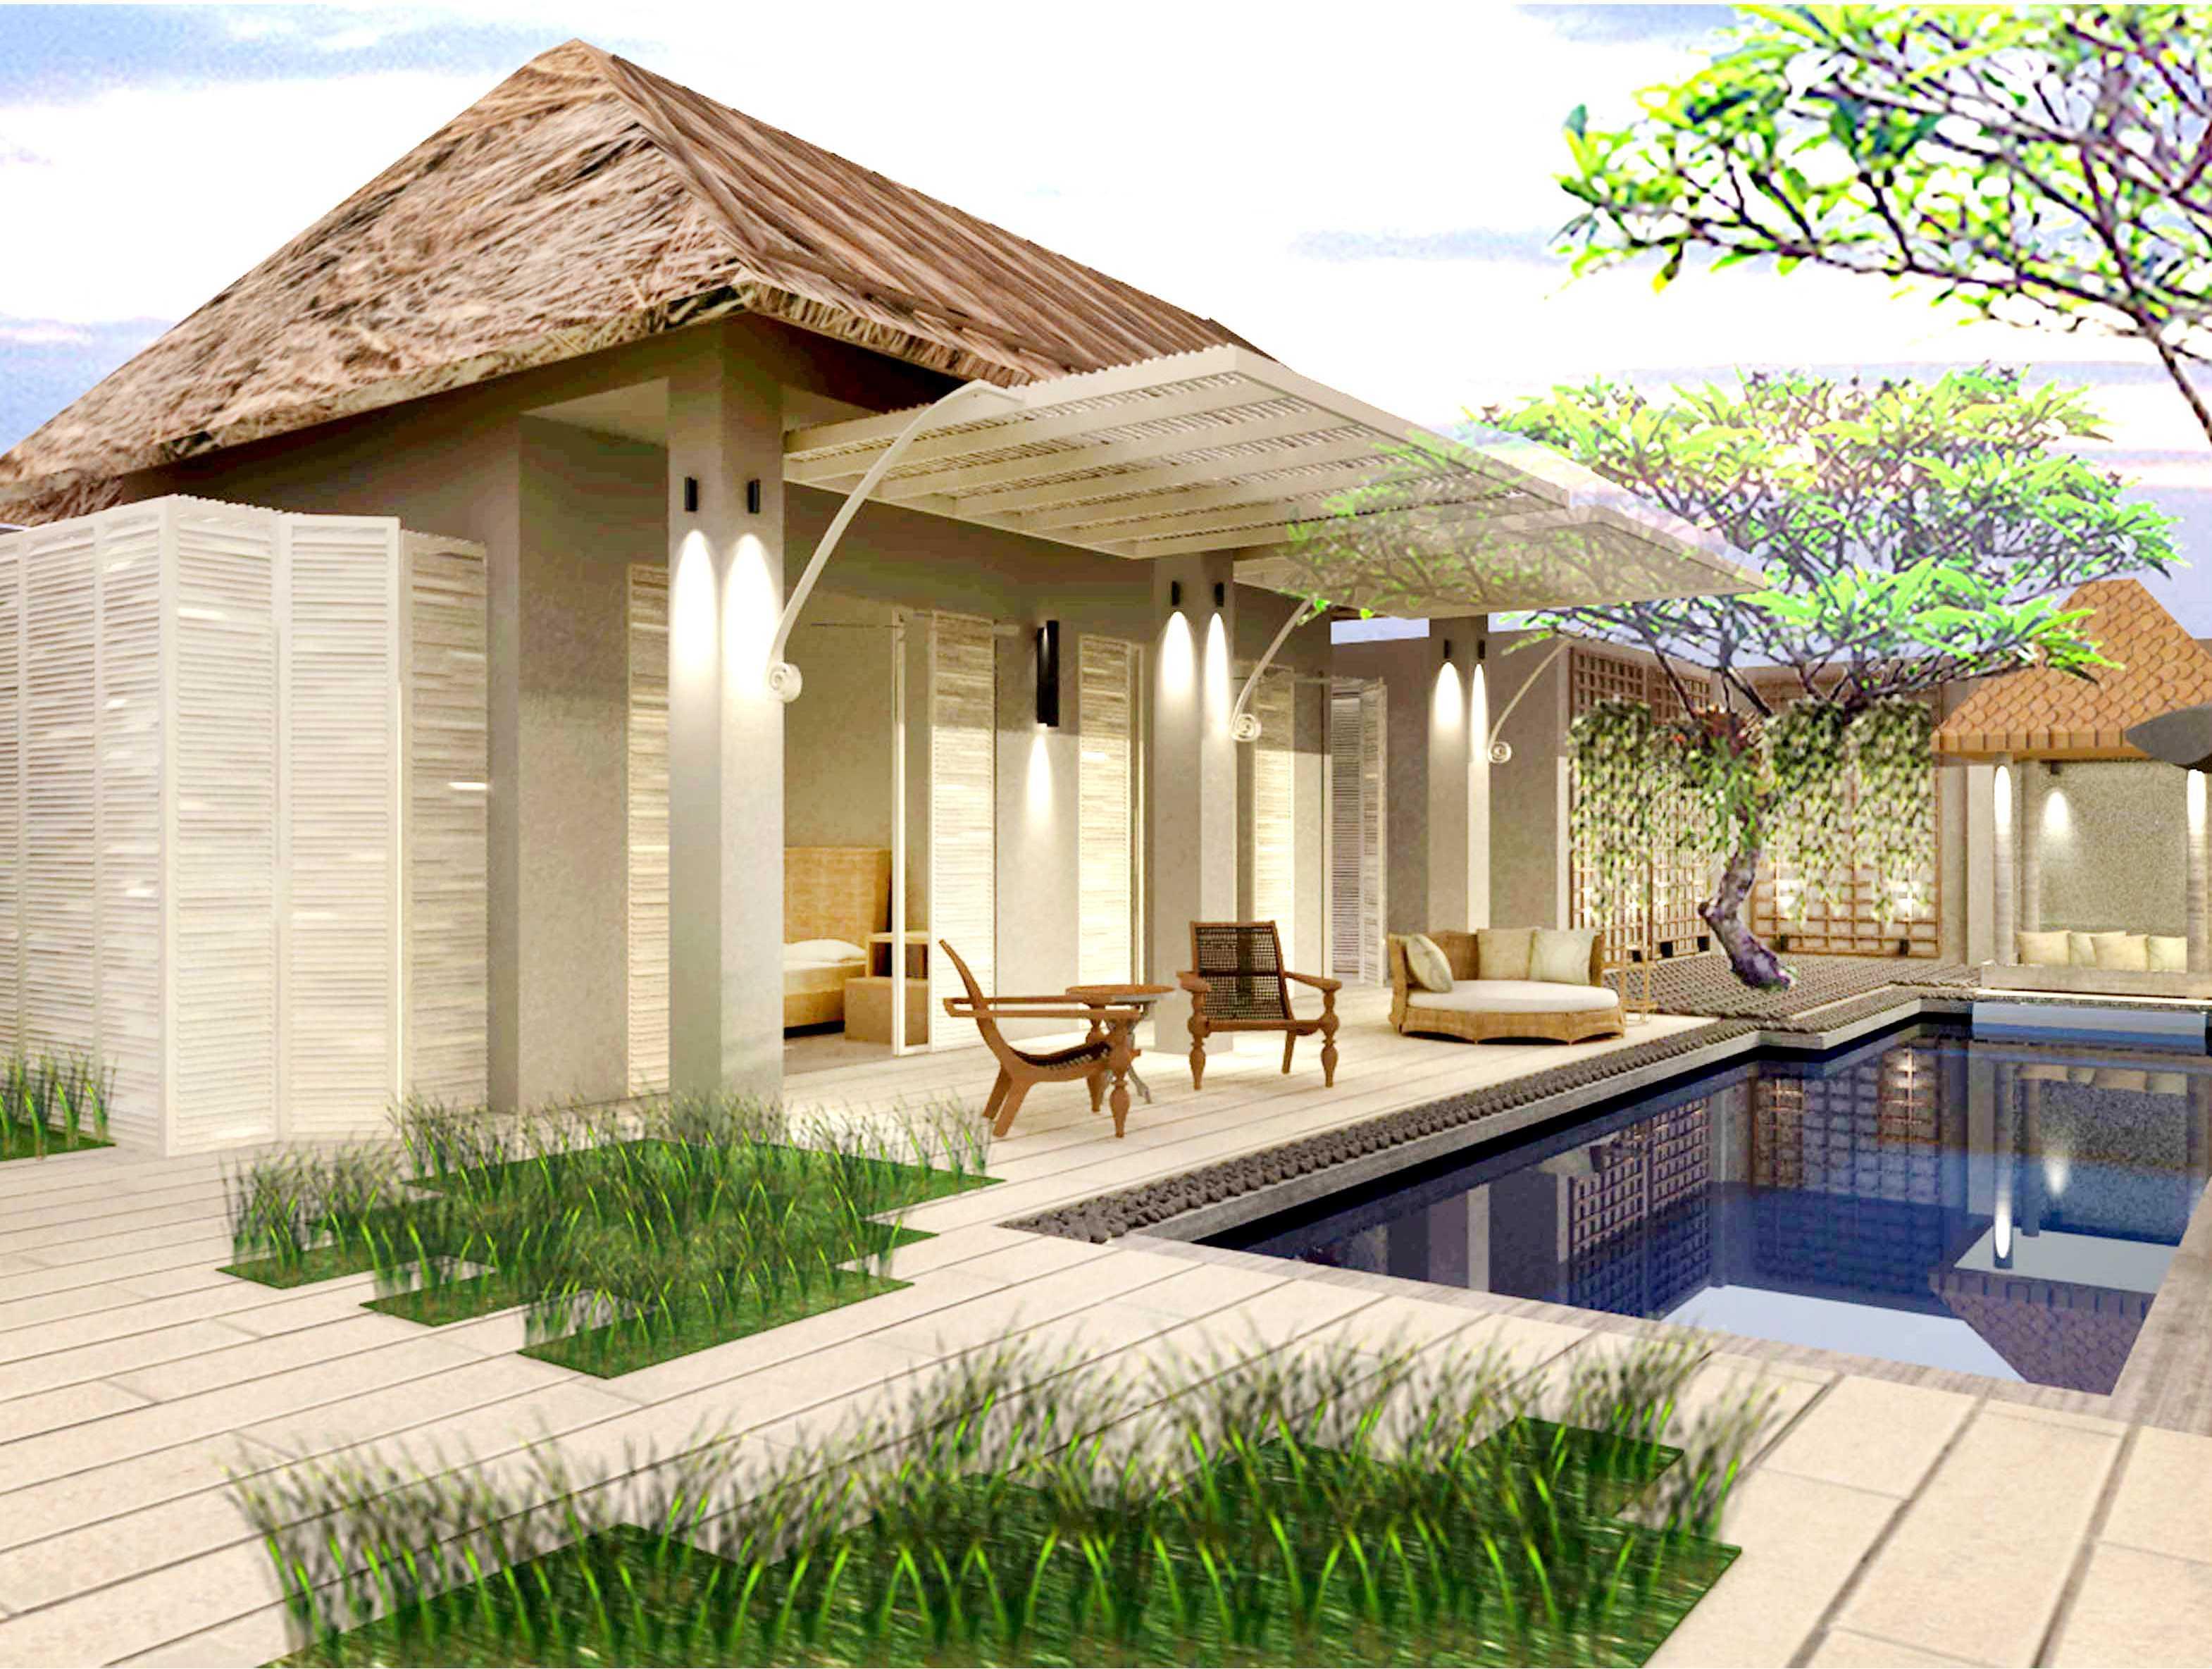 Rinto Katili Villa Resort Iksora Bali, Indonesia Bali, Indonesia Exterior View Traditional,asian,tropical,tradisional  38254